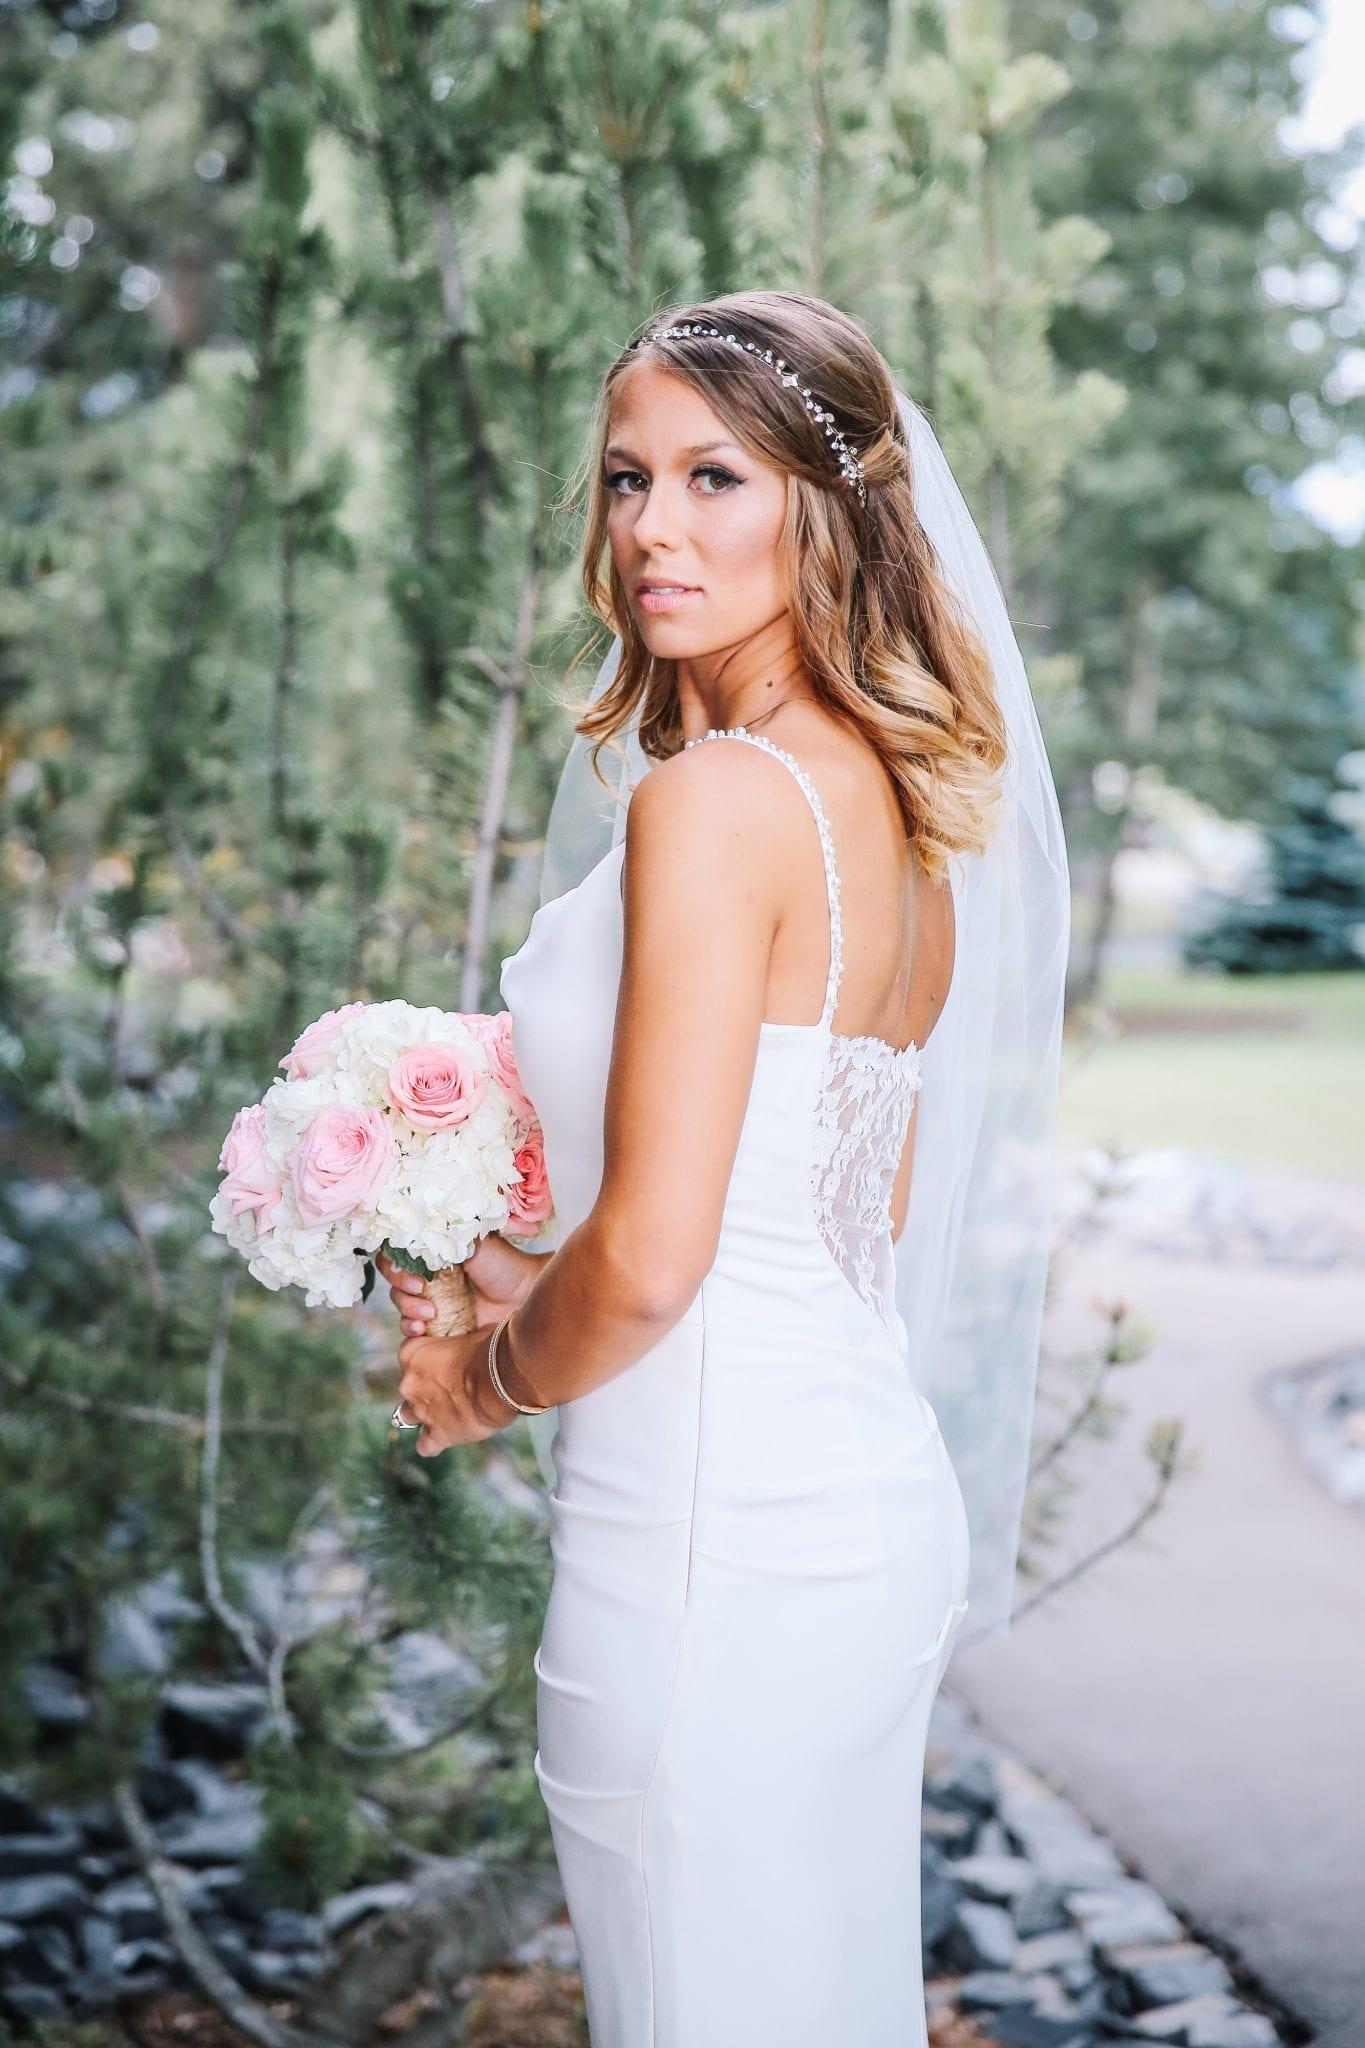 Beautiful bride - Photo credit Winter Lotus Photography